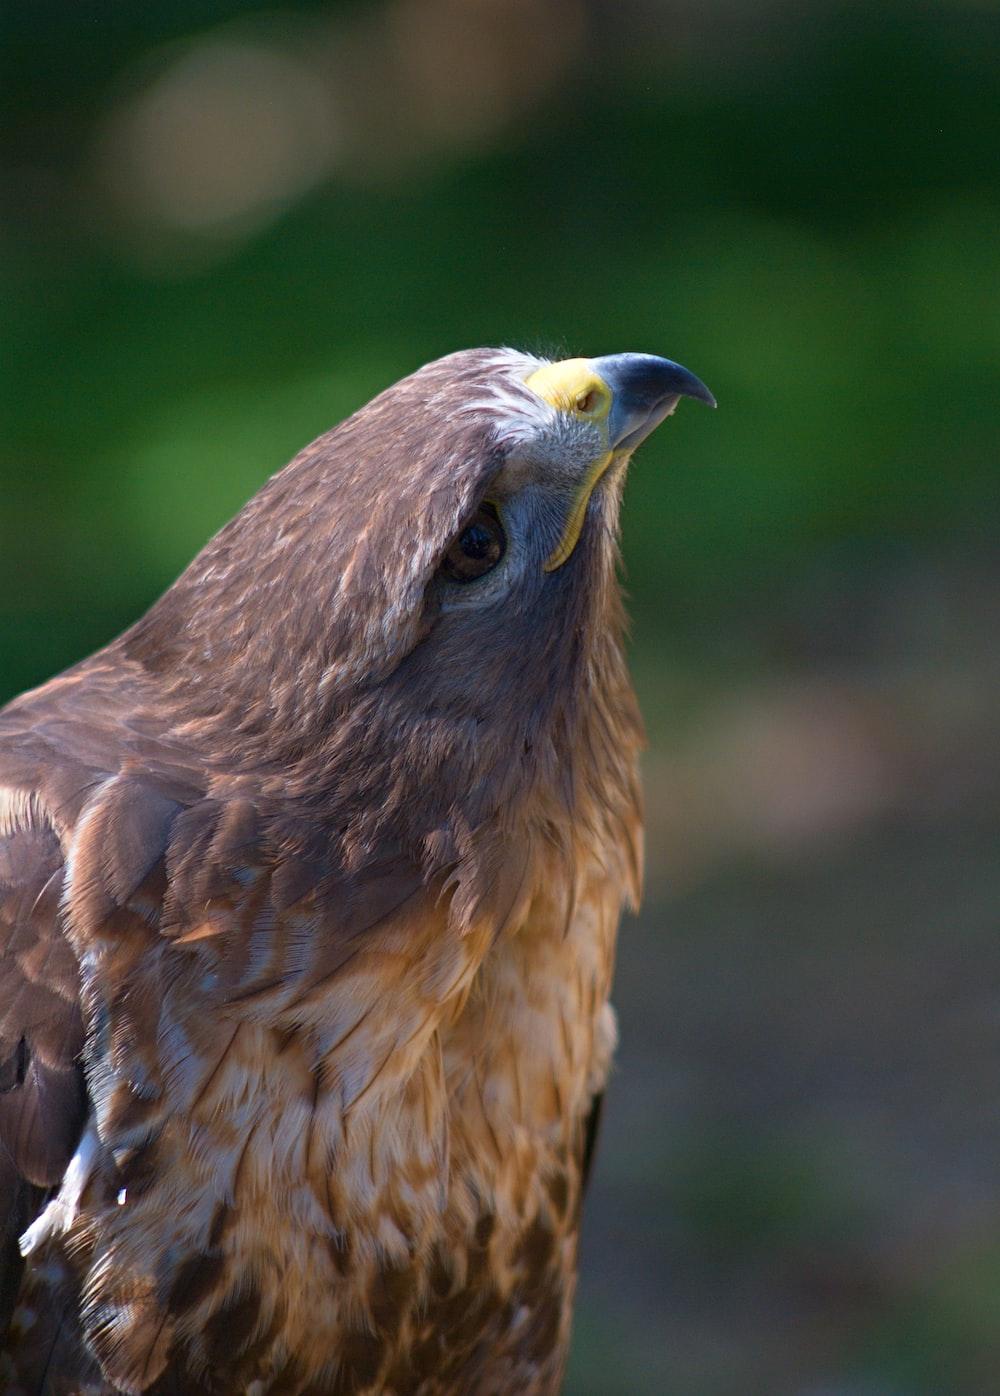 brown hawk selective focus phot o